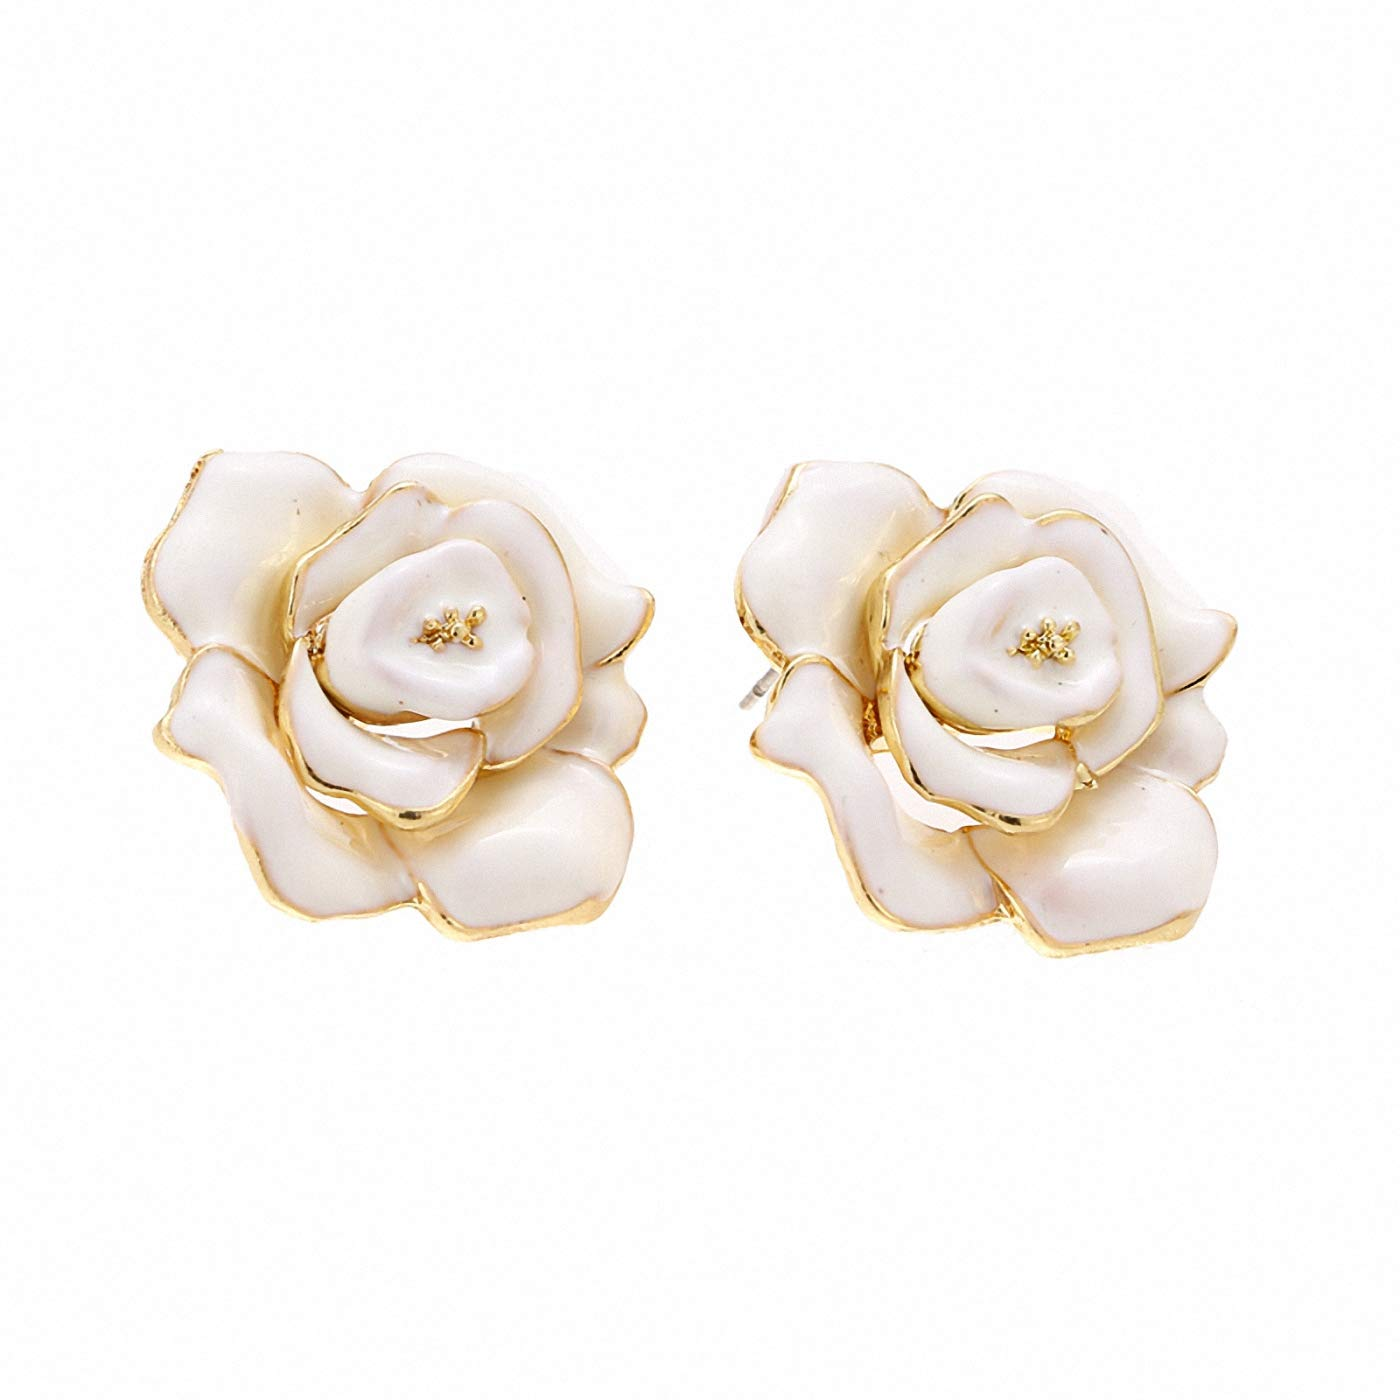 Red Enamel Rose Flower Stud Earrings Big Charms Romantic Cheap Earrings Woman Wedding Earrings